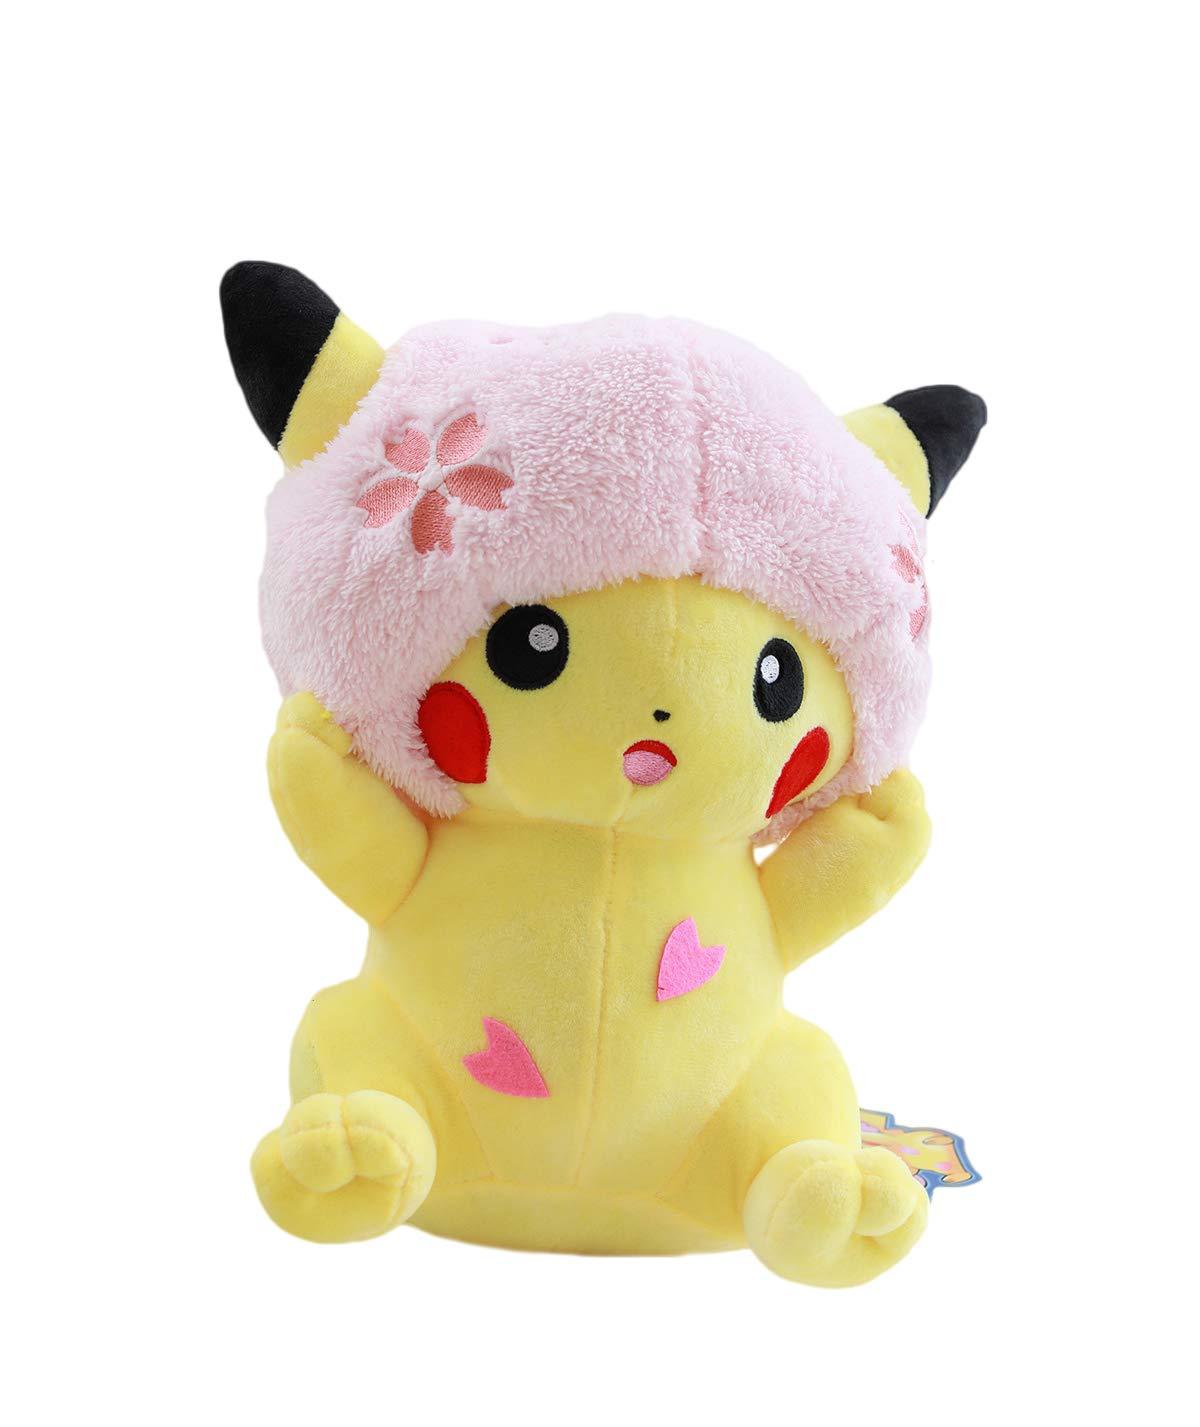 Straiver Detective Pikachu Plush Figure Stuffed Animal Toys Plush Doll 13.8'' by Stariver Store